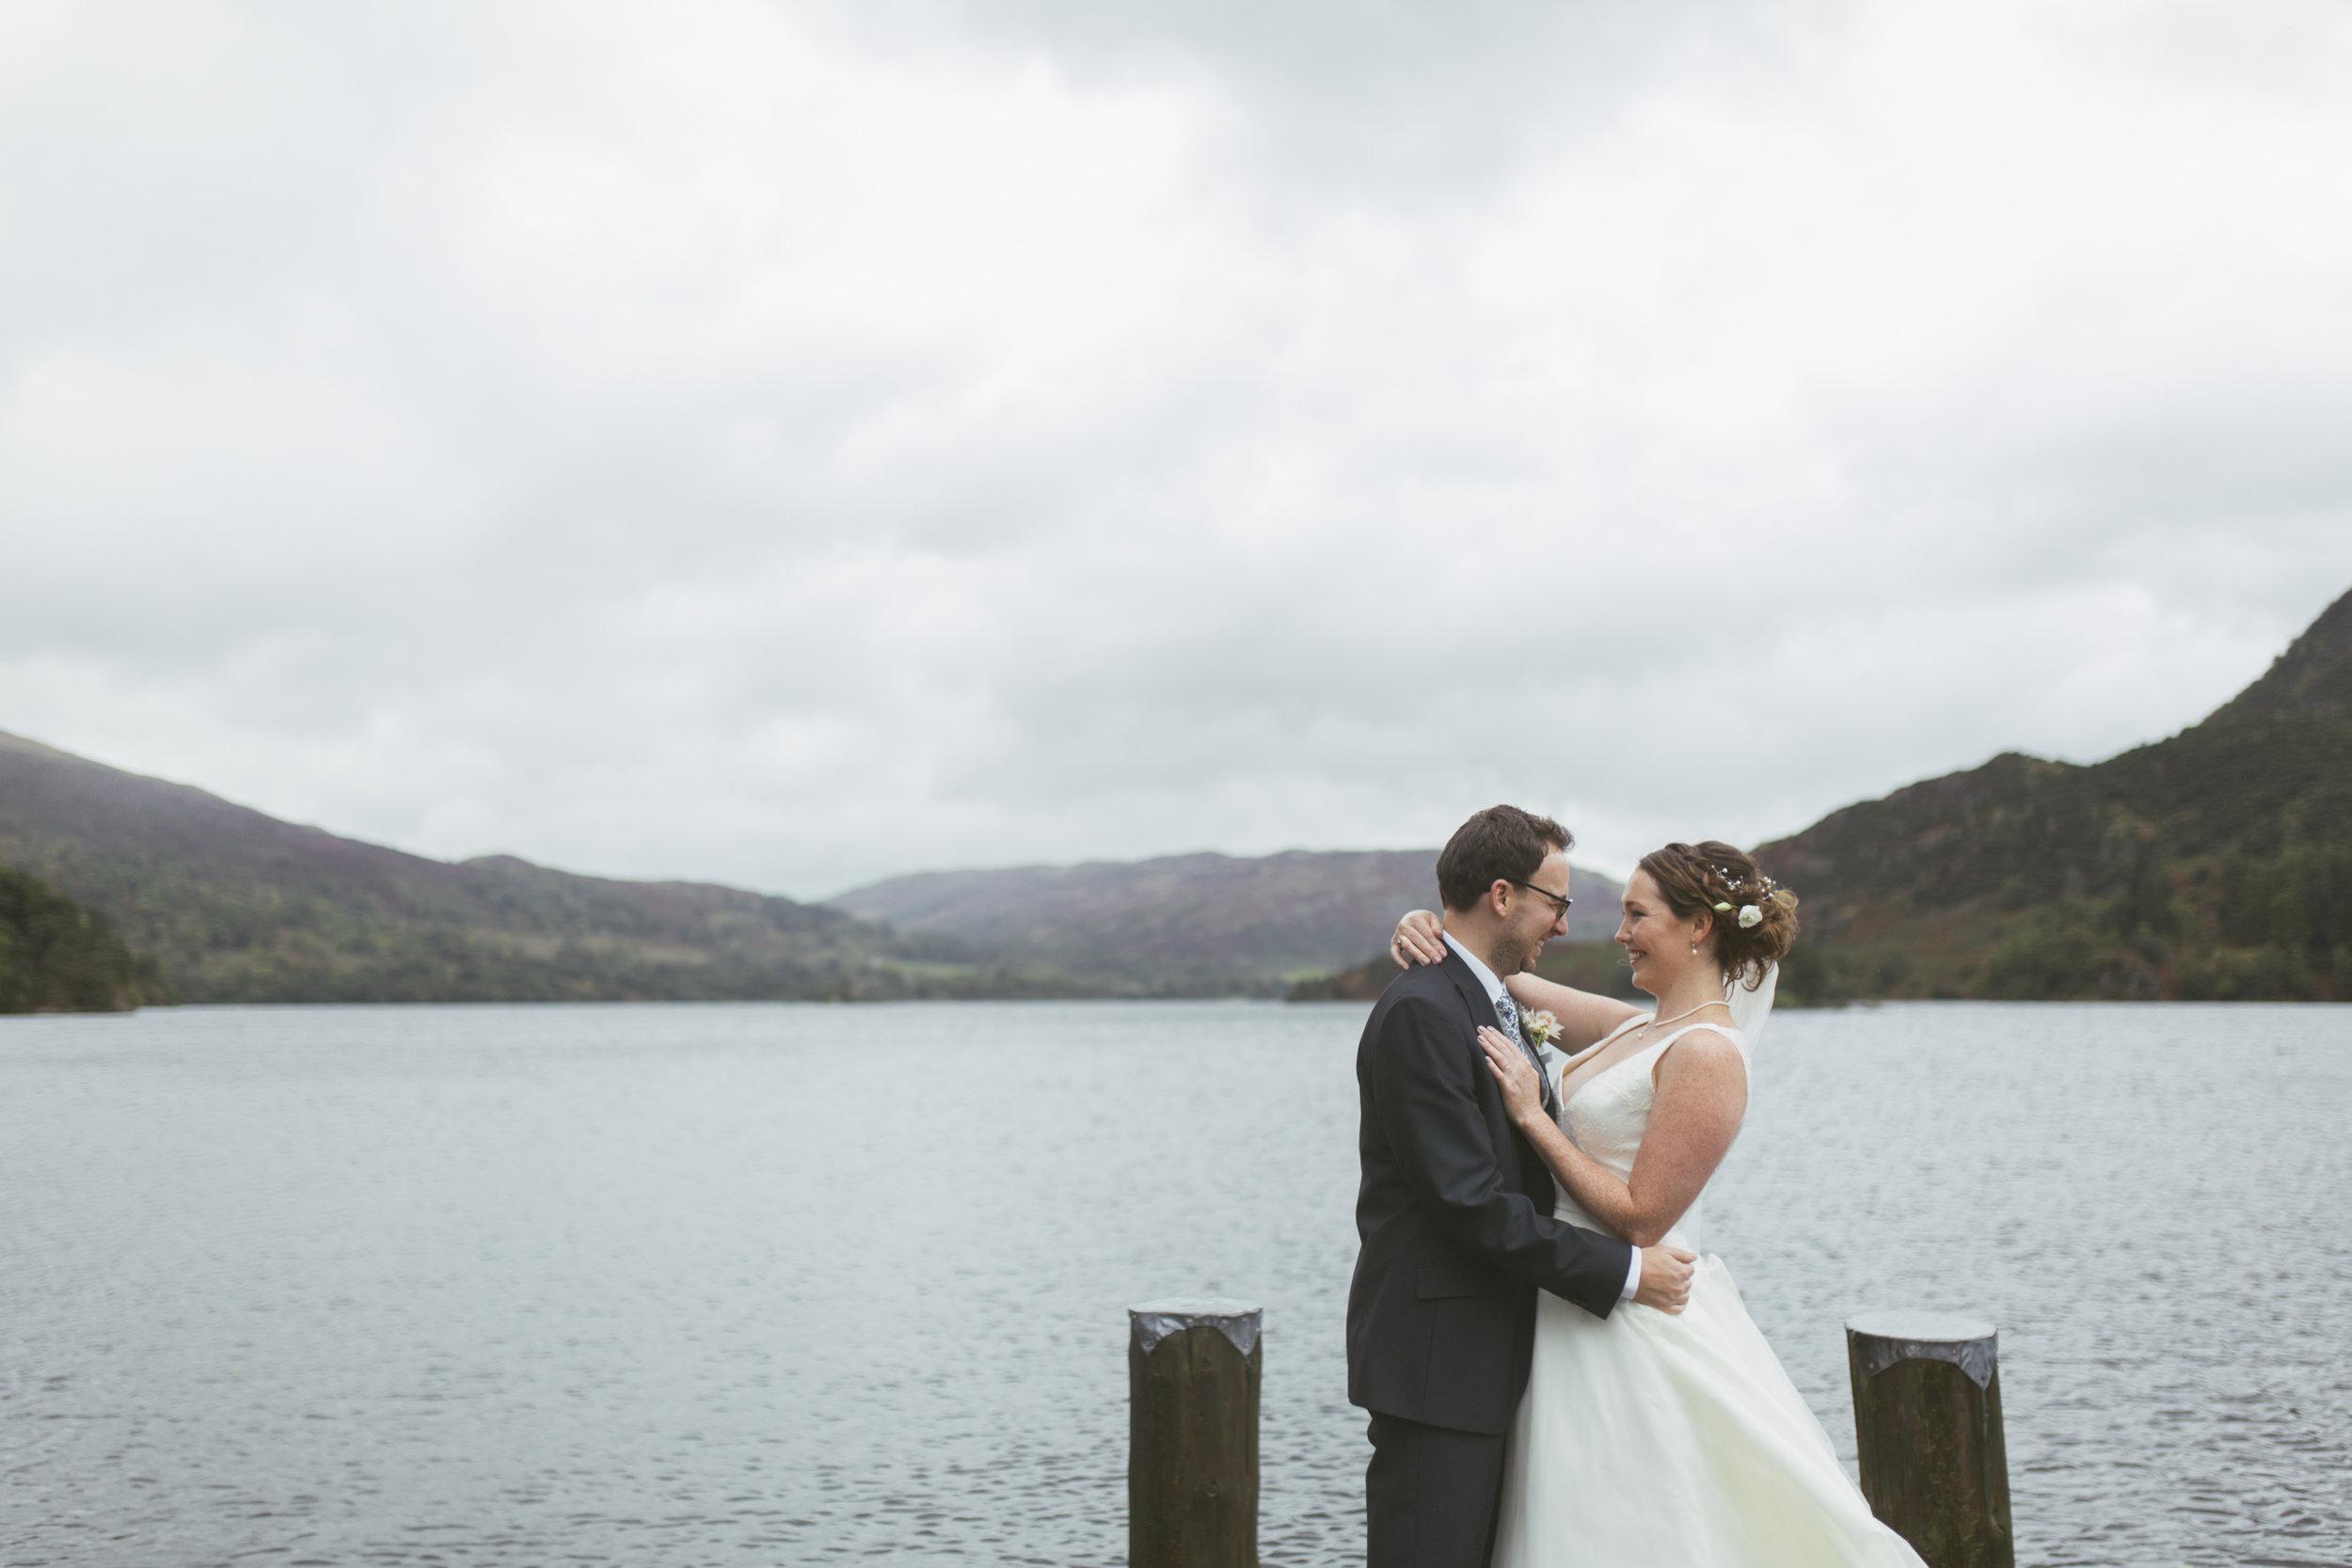 Helena Charlotte Wedding Photography1.jpg